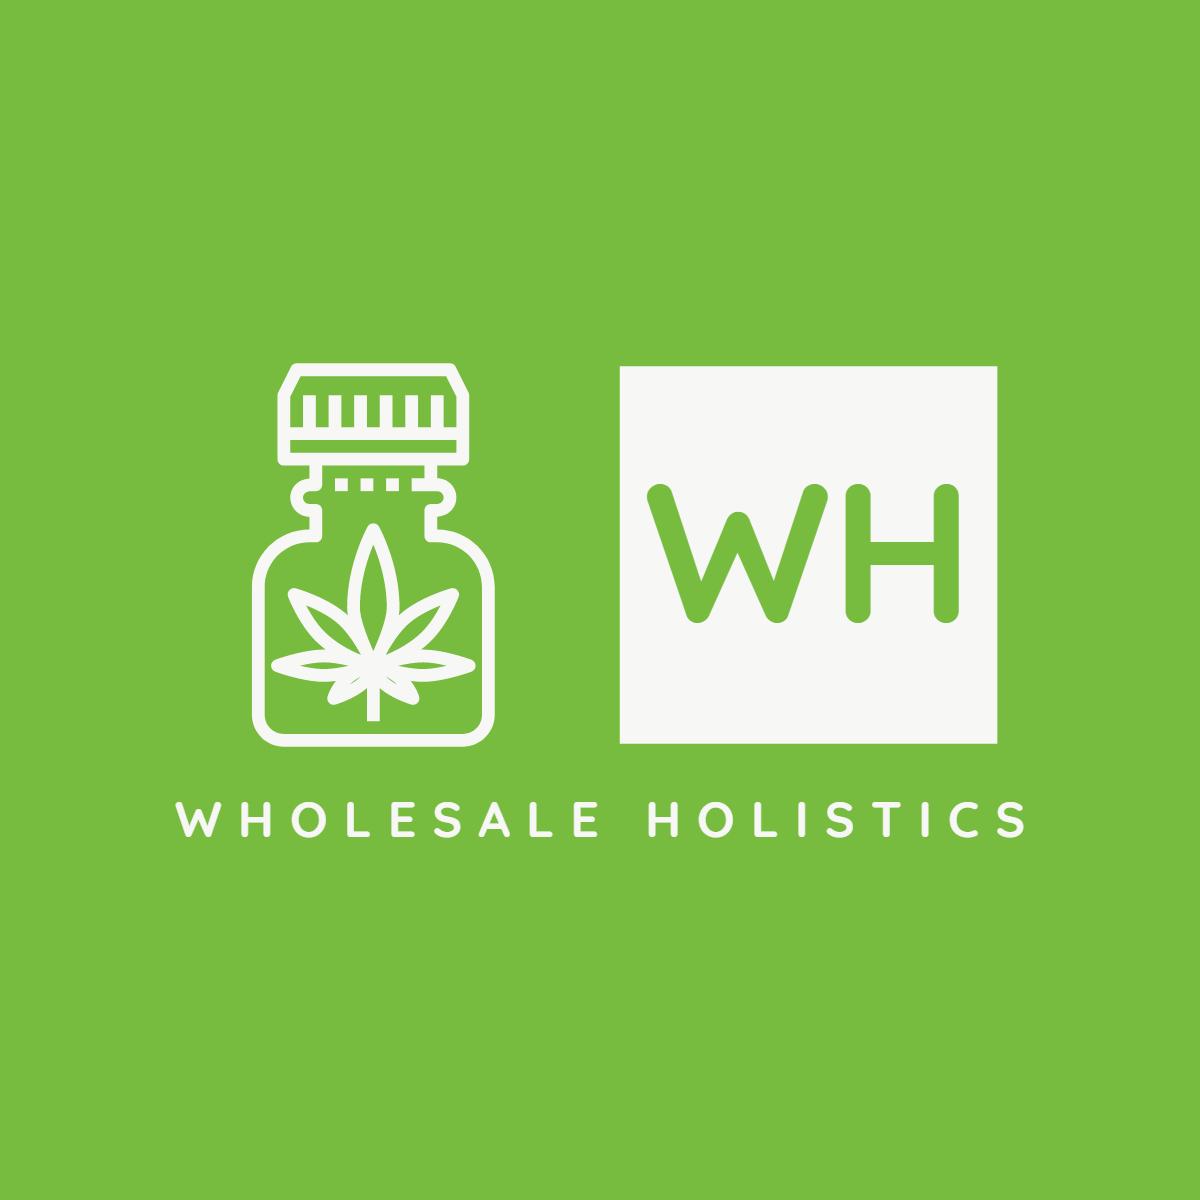 Wholesale Holistics